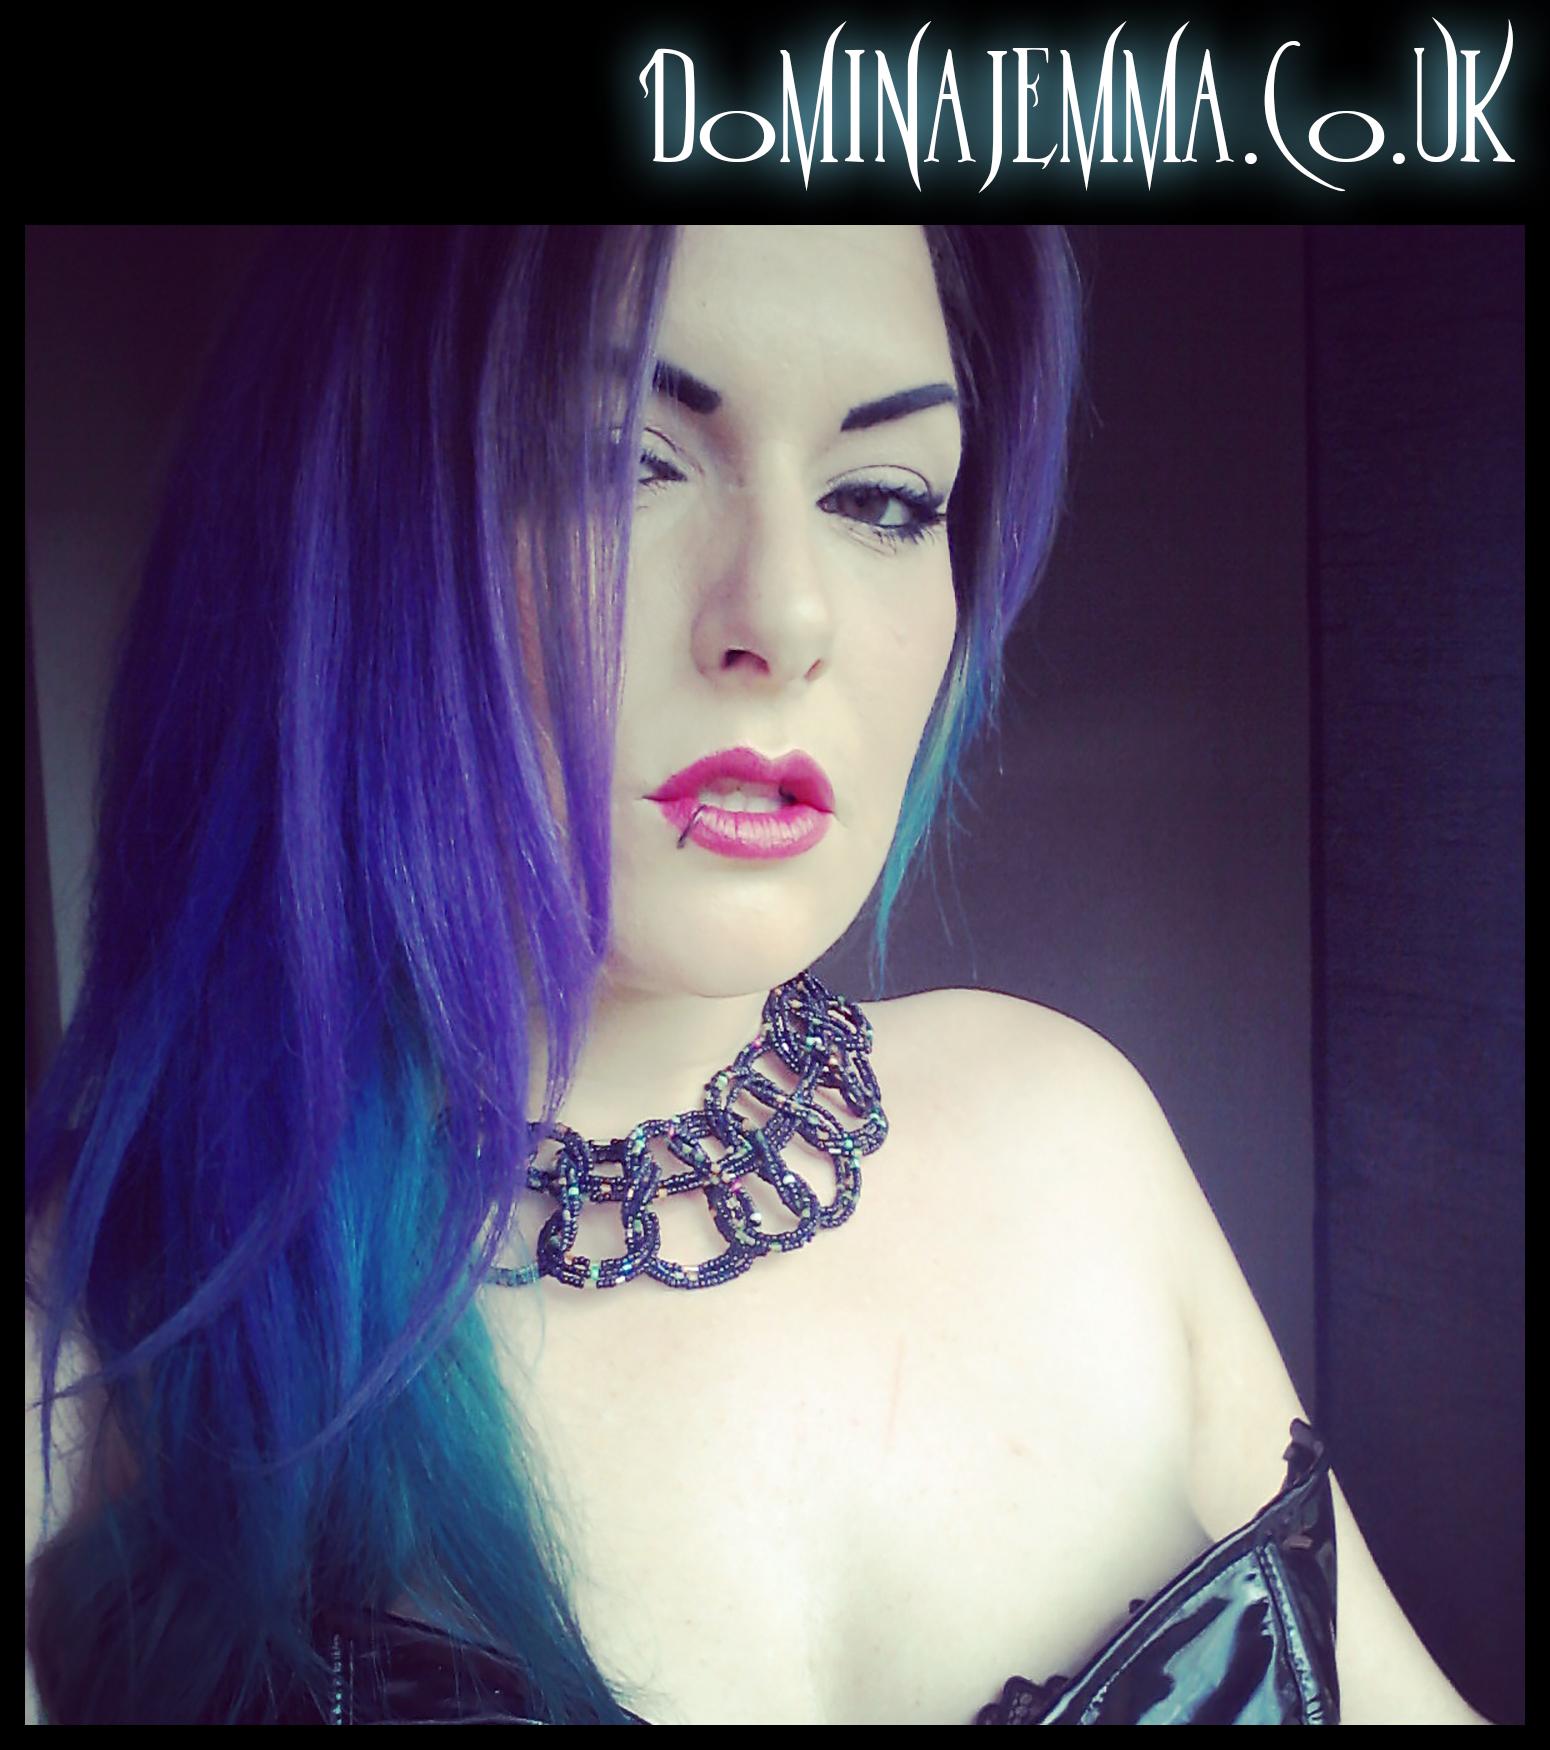 Mistress Roma / Swindon